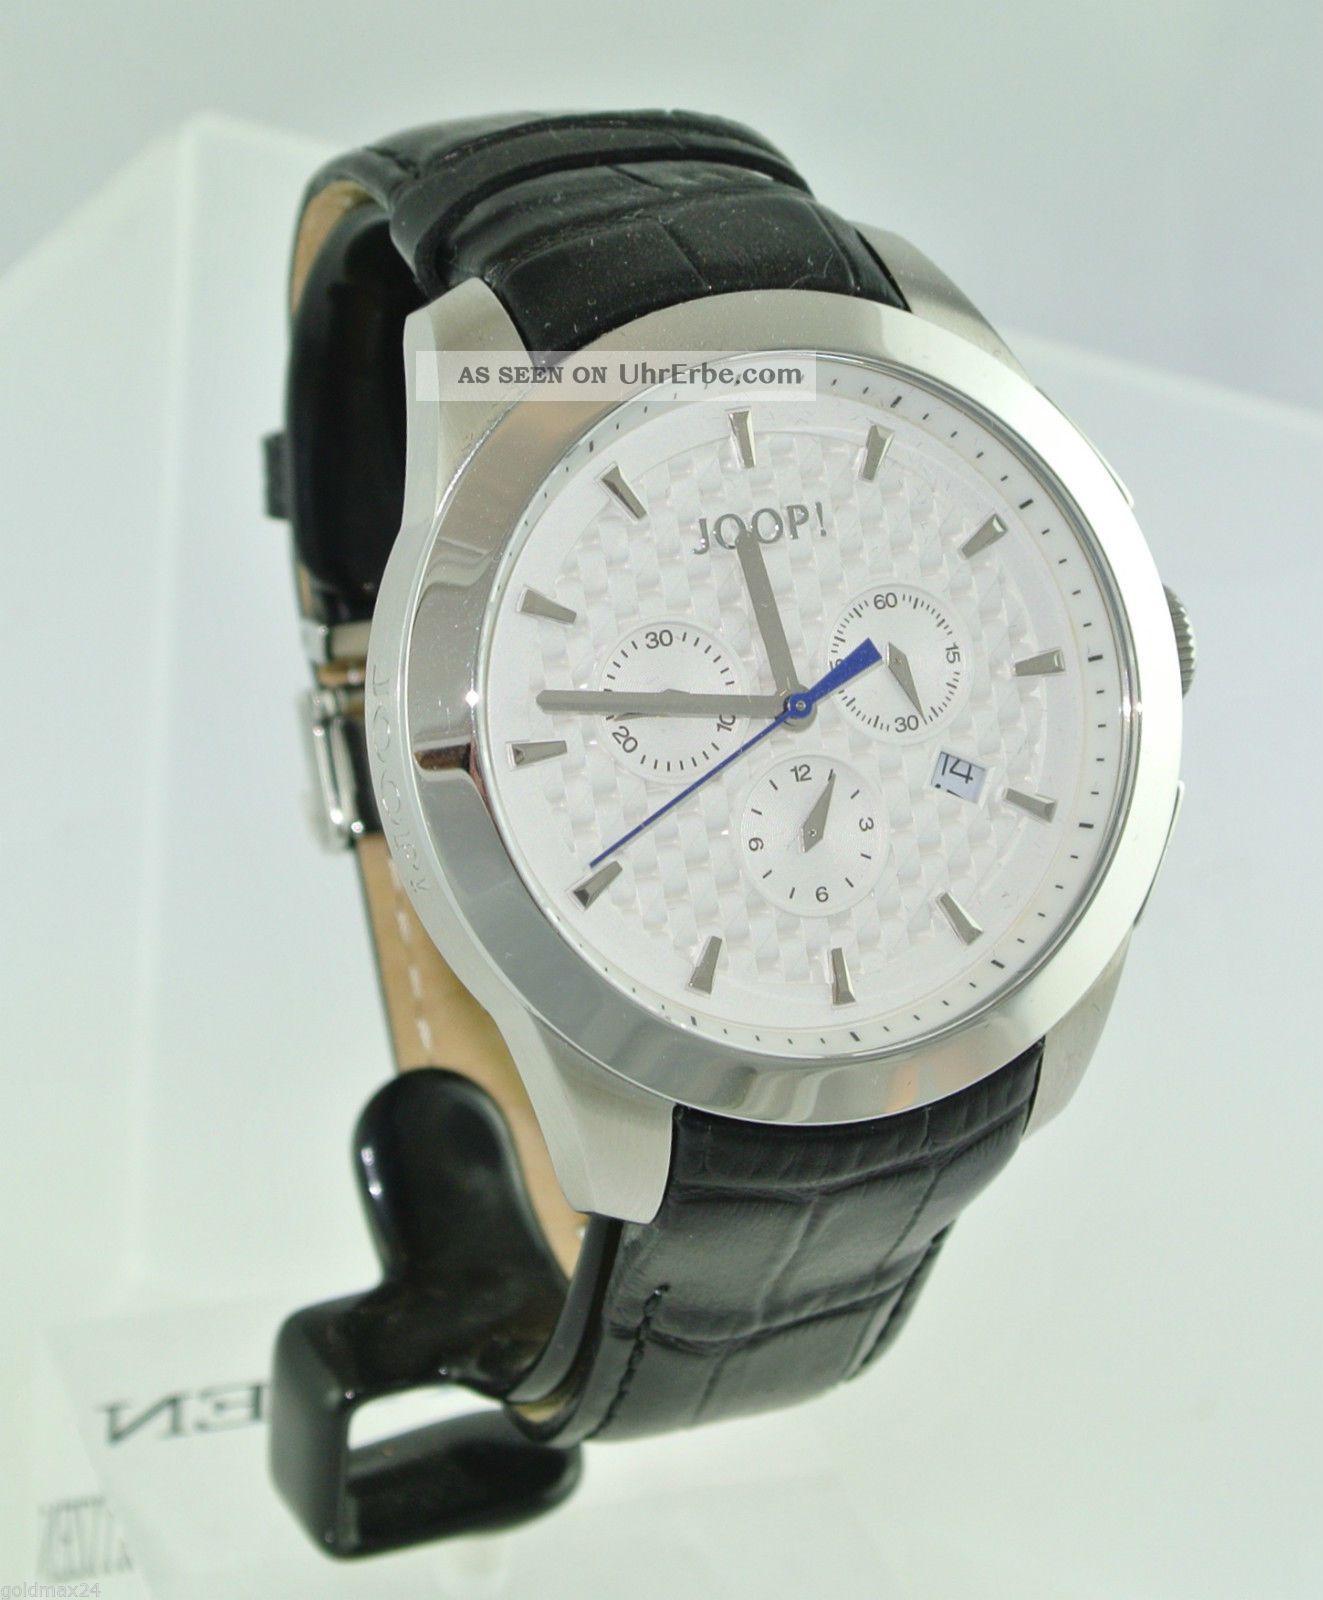 Joop Legend Xl Herren - Armbanduhr - Chronograph / Quarz / Edelstahl Armbanduhren Bild